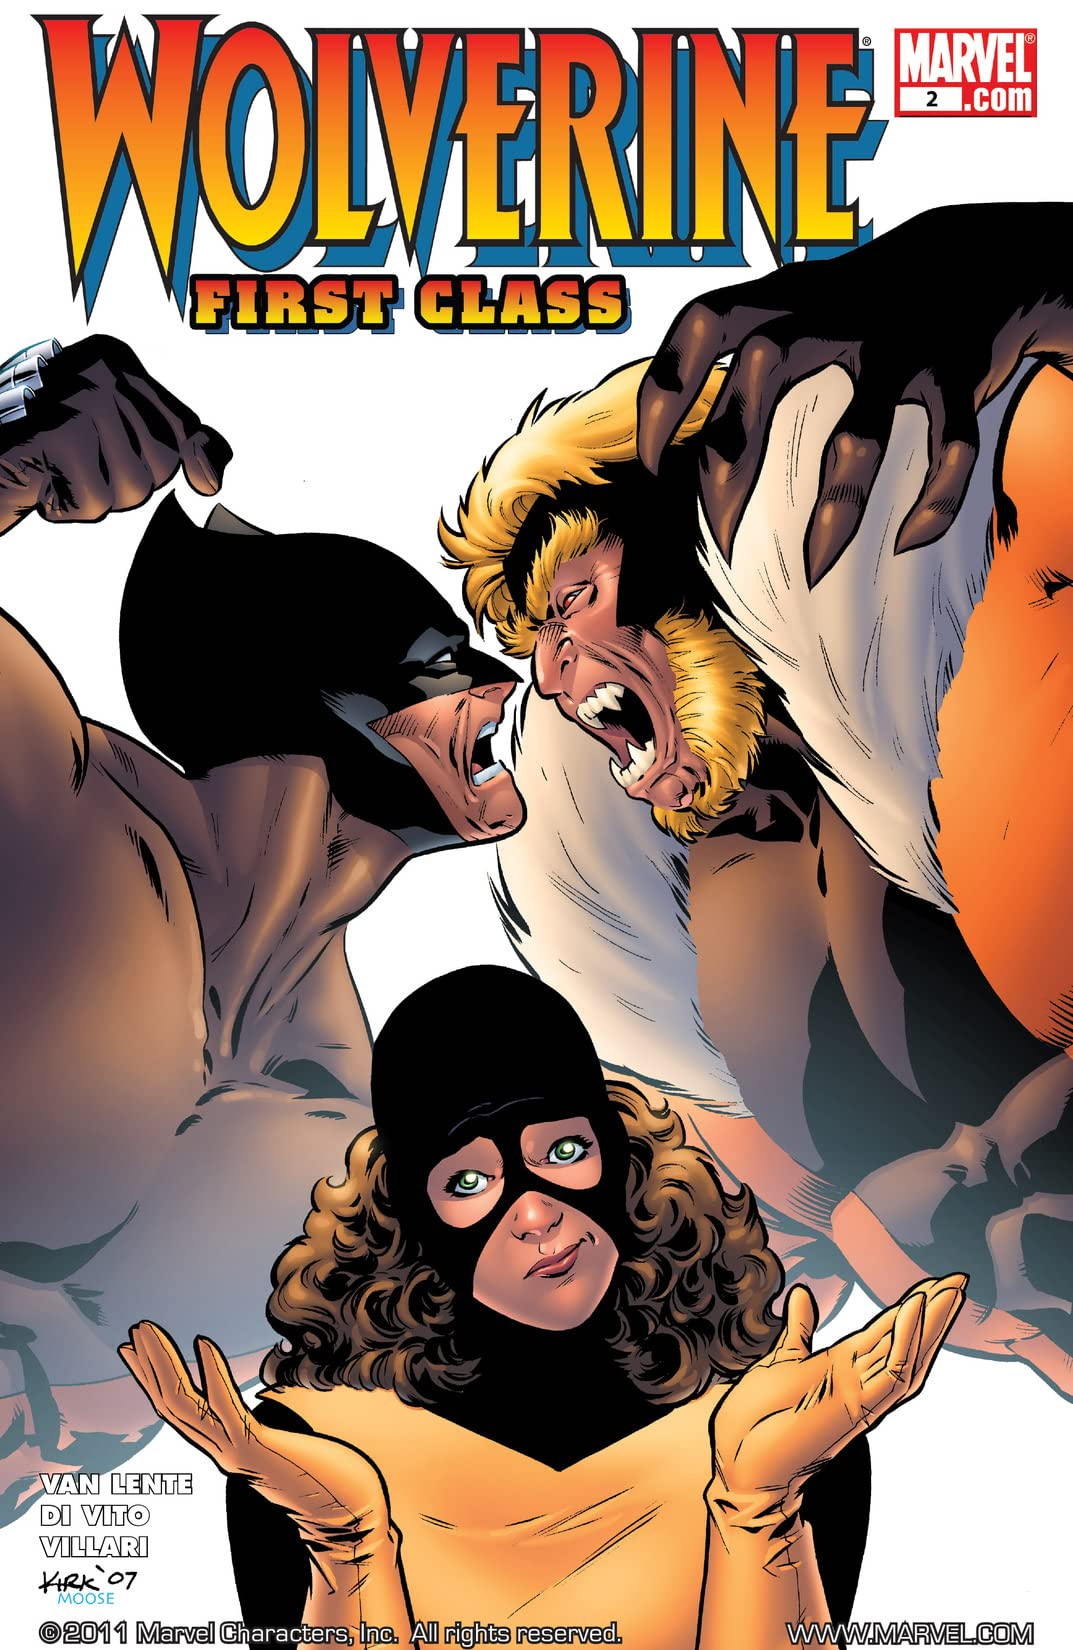 Wolverine: First Class Vol 1 2